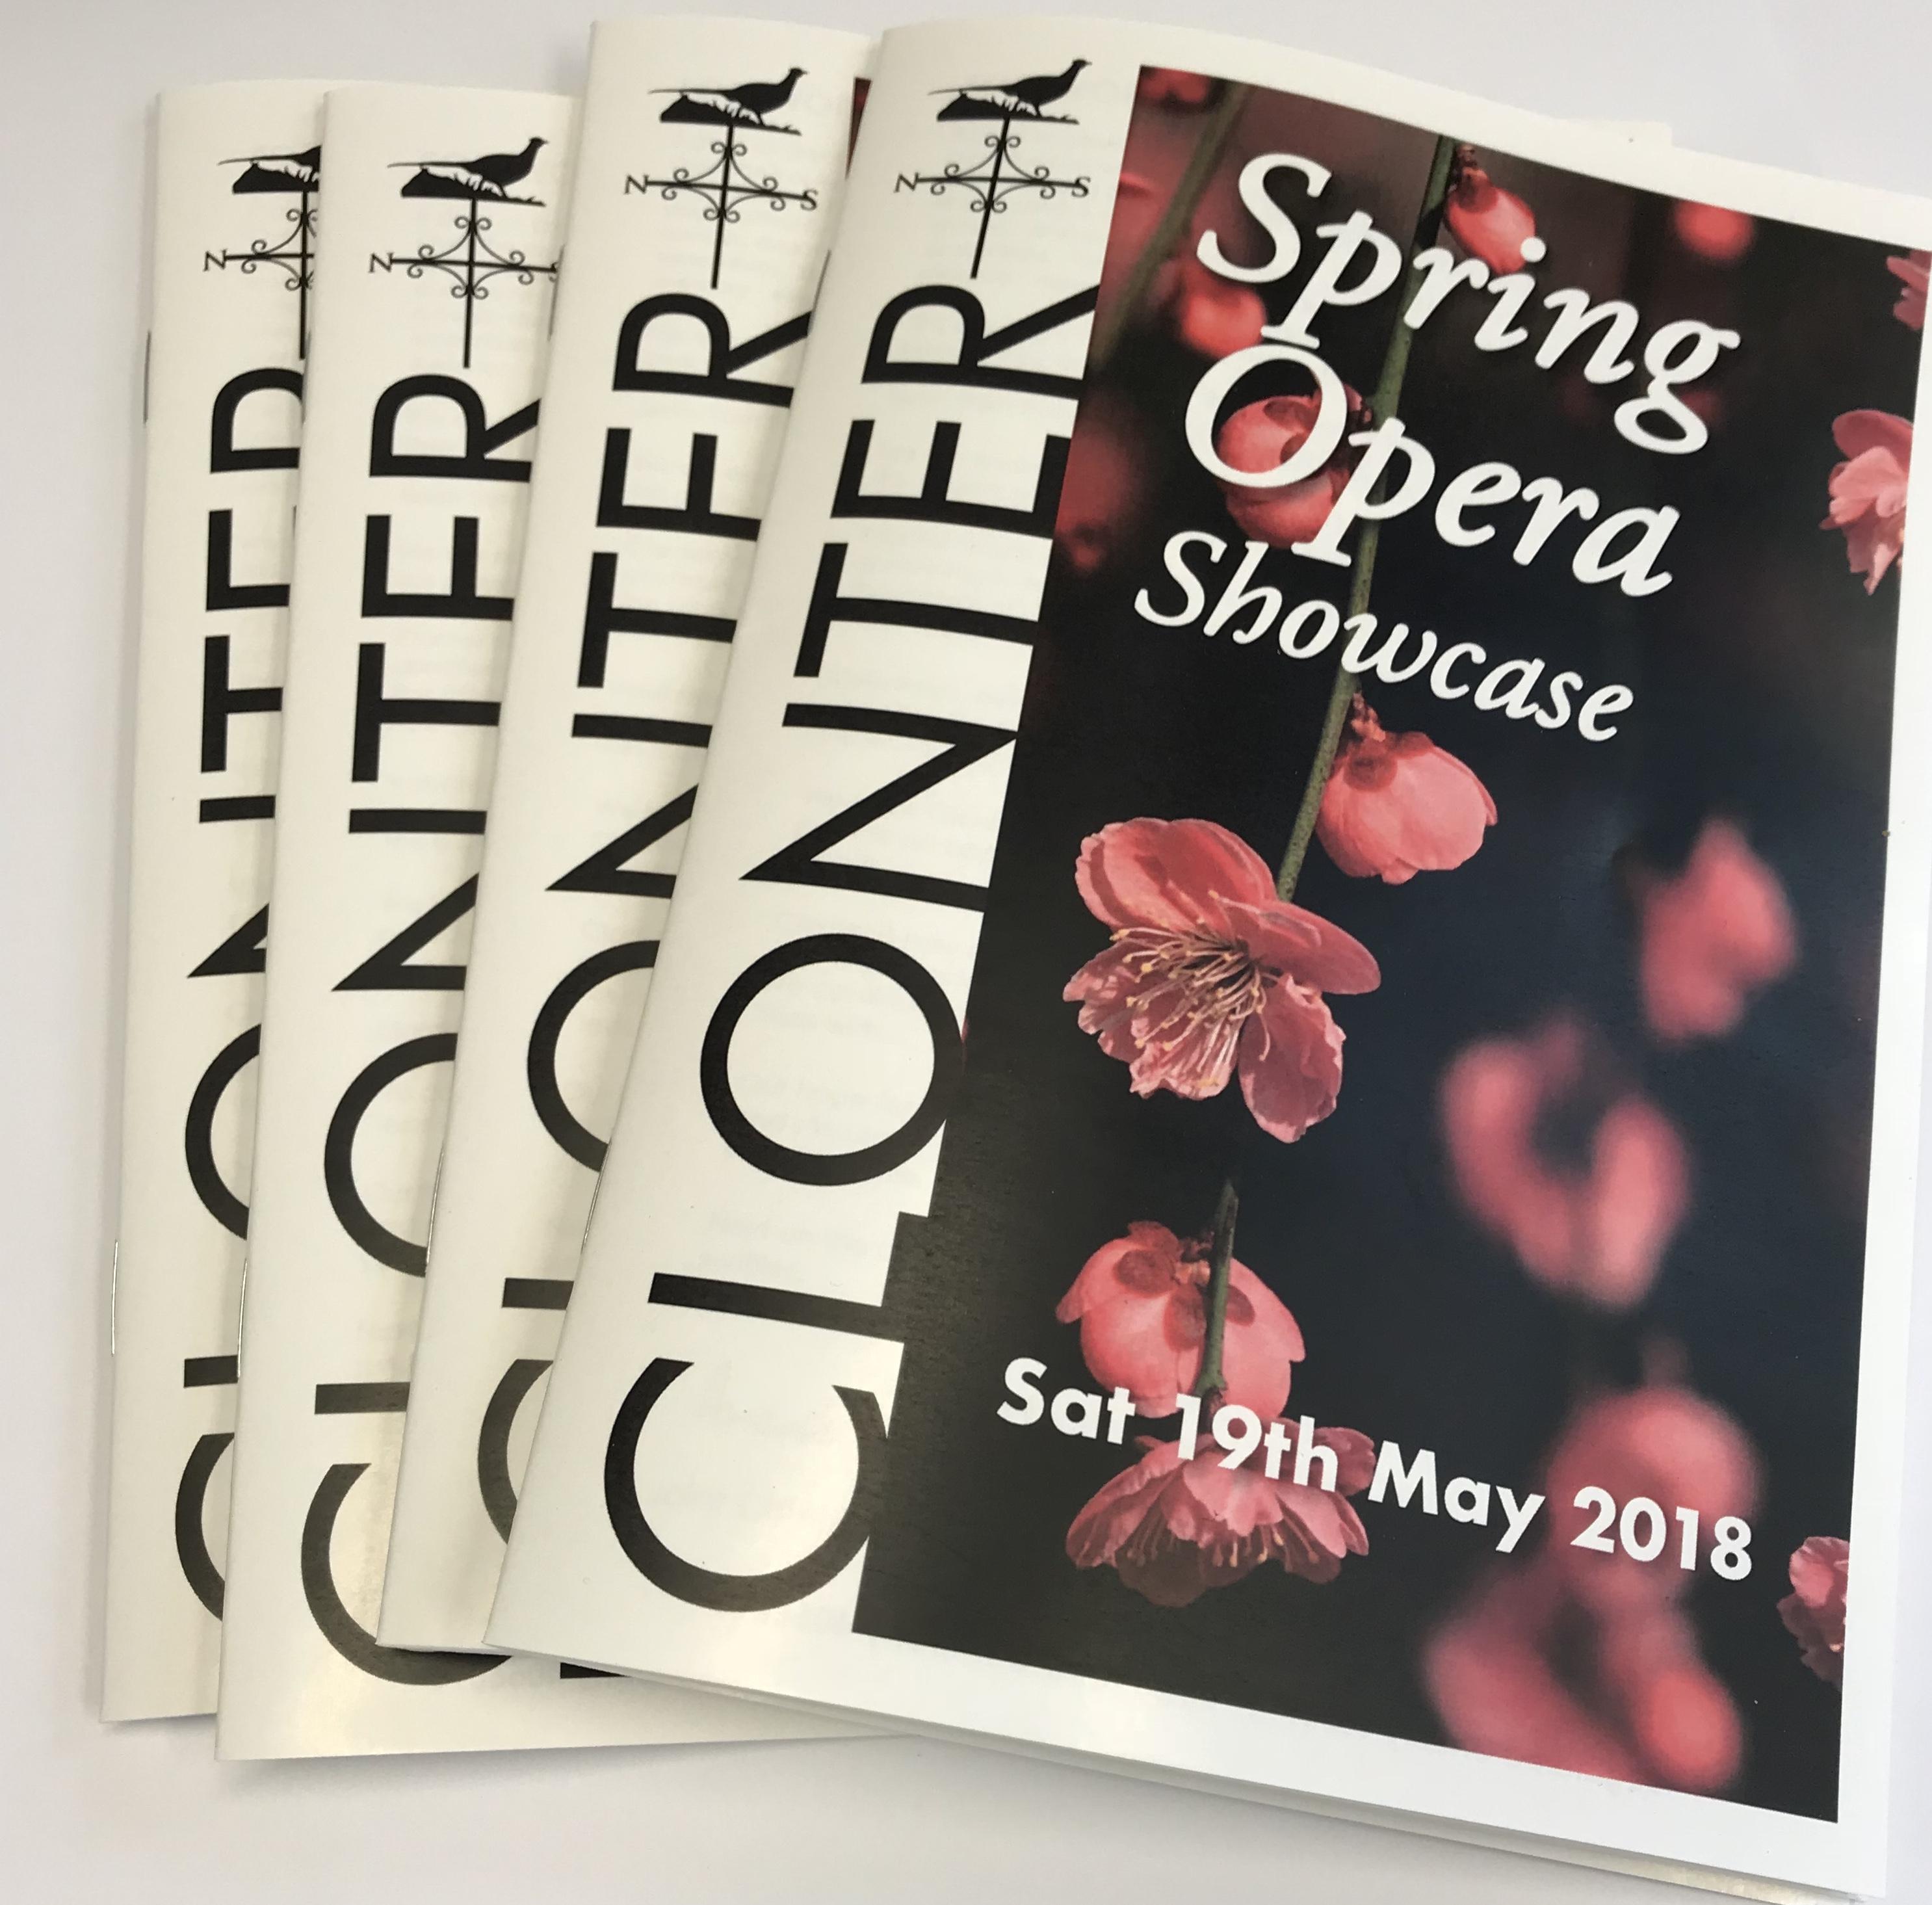 Clonter Spring Opera Showcase Programmes